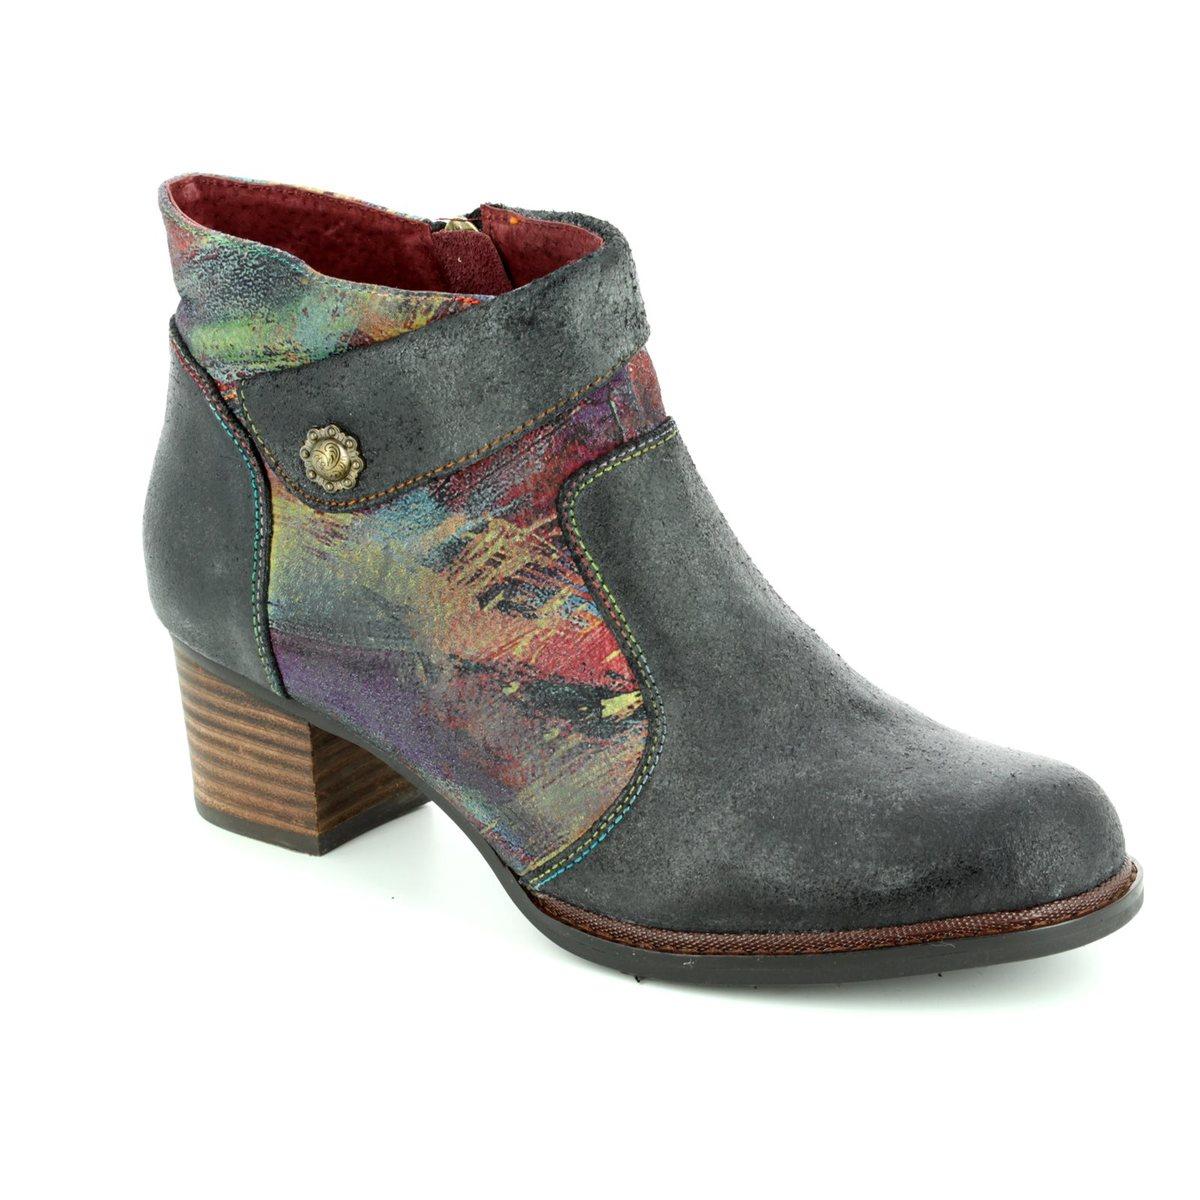 e4dc1d0b1 Laura Vita Ankle Boots - Black multi - 3002/30 ALEXIA 13